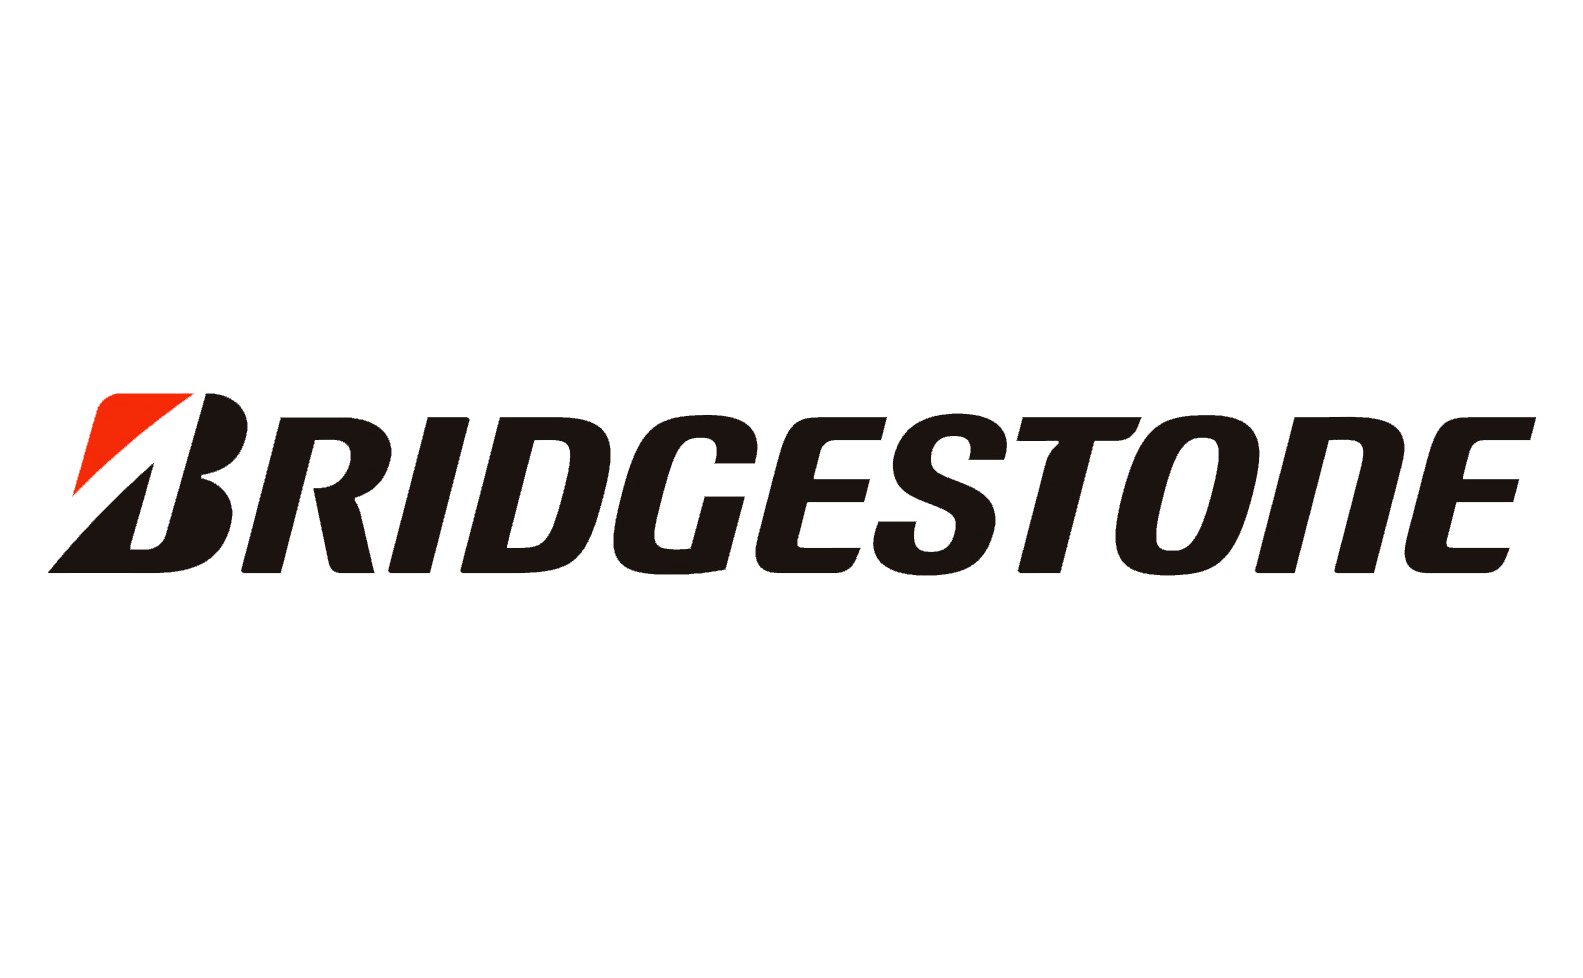 BRIDGESTONE - png.png